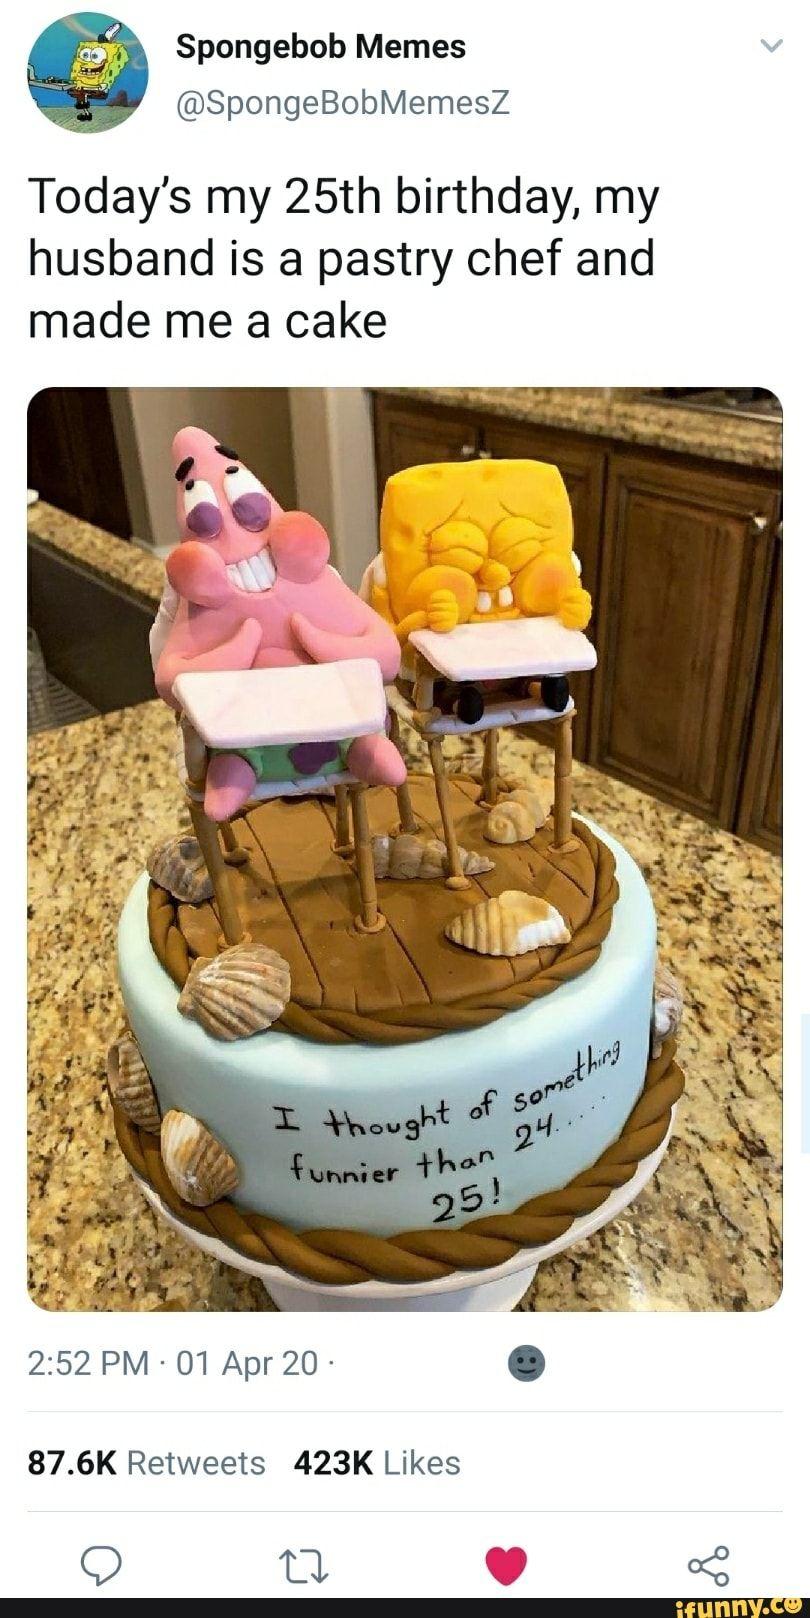 Spongebob Cake Meme : spongebob, Spongebob, Memes, Today's, Birthday,, Husband, Pastry, 87.6K, Retweets, Likes, IFunny, Birthday, Cakes,, Funny